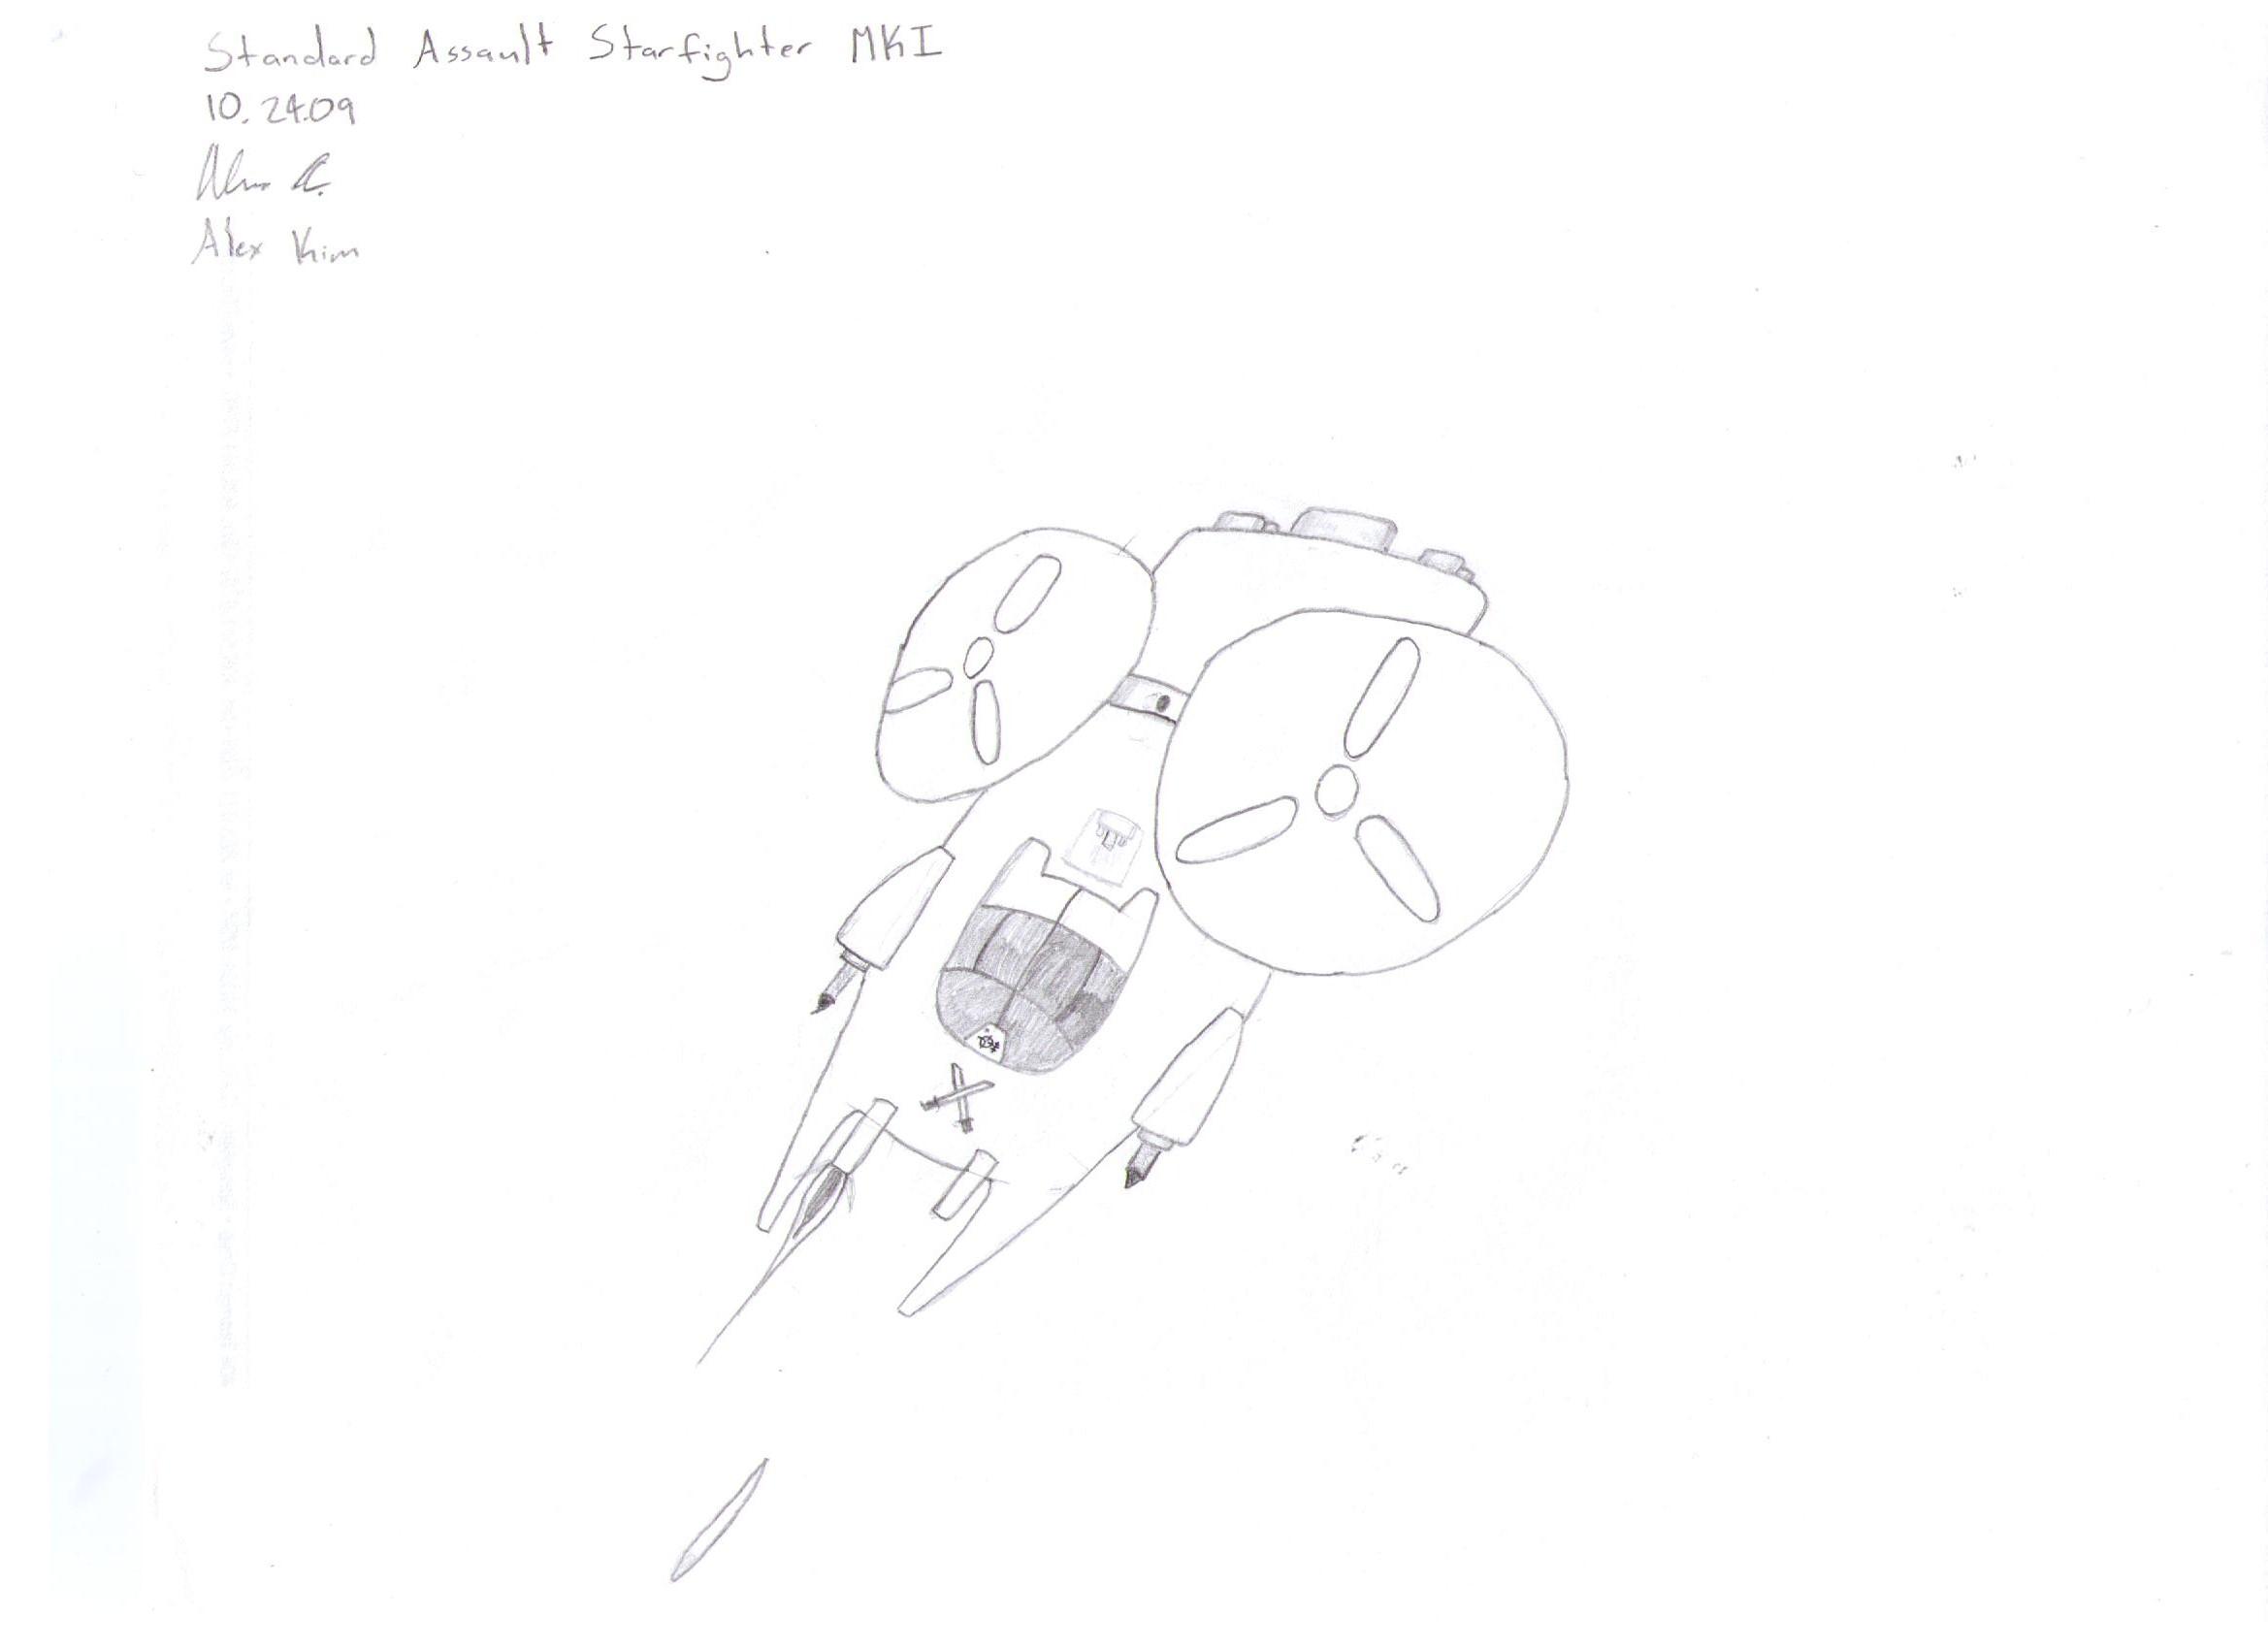 Standard Assault SFMKI